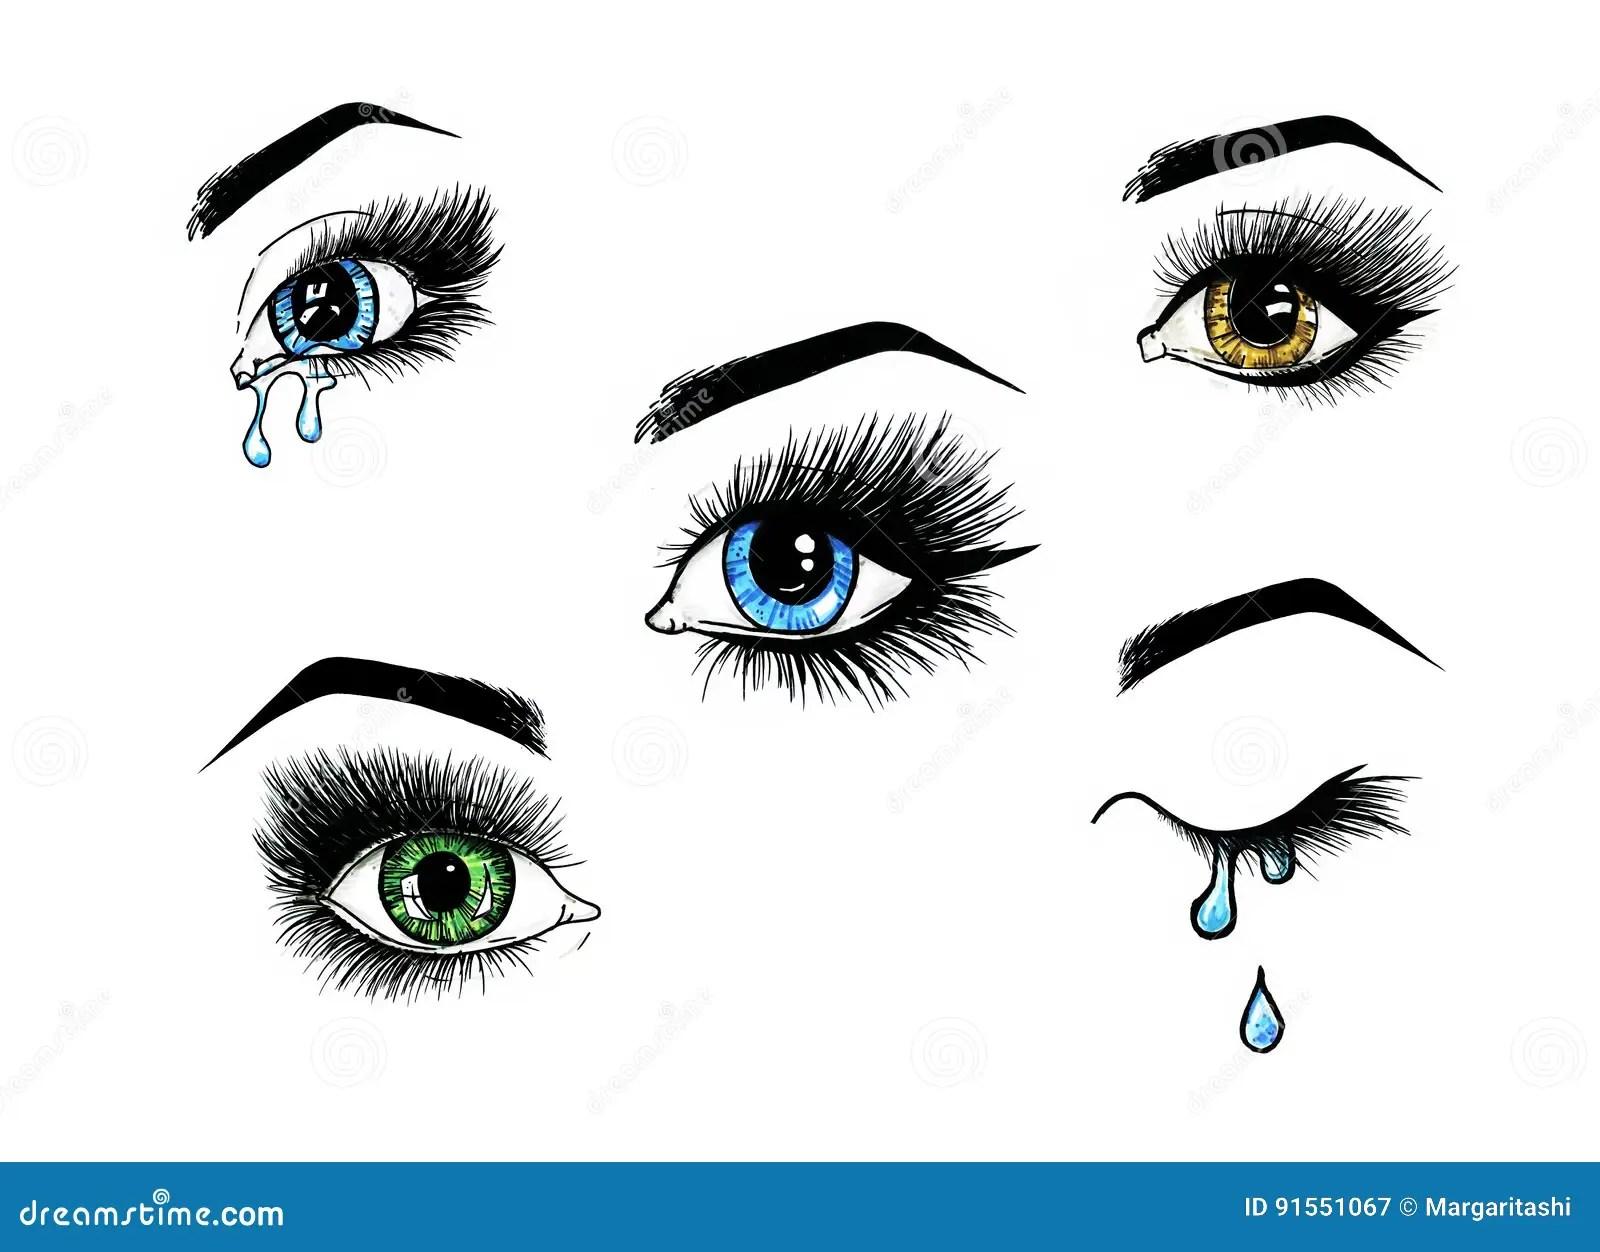 Beautiful Open Female Eyes Set With Long Eyelashes Is On A